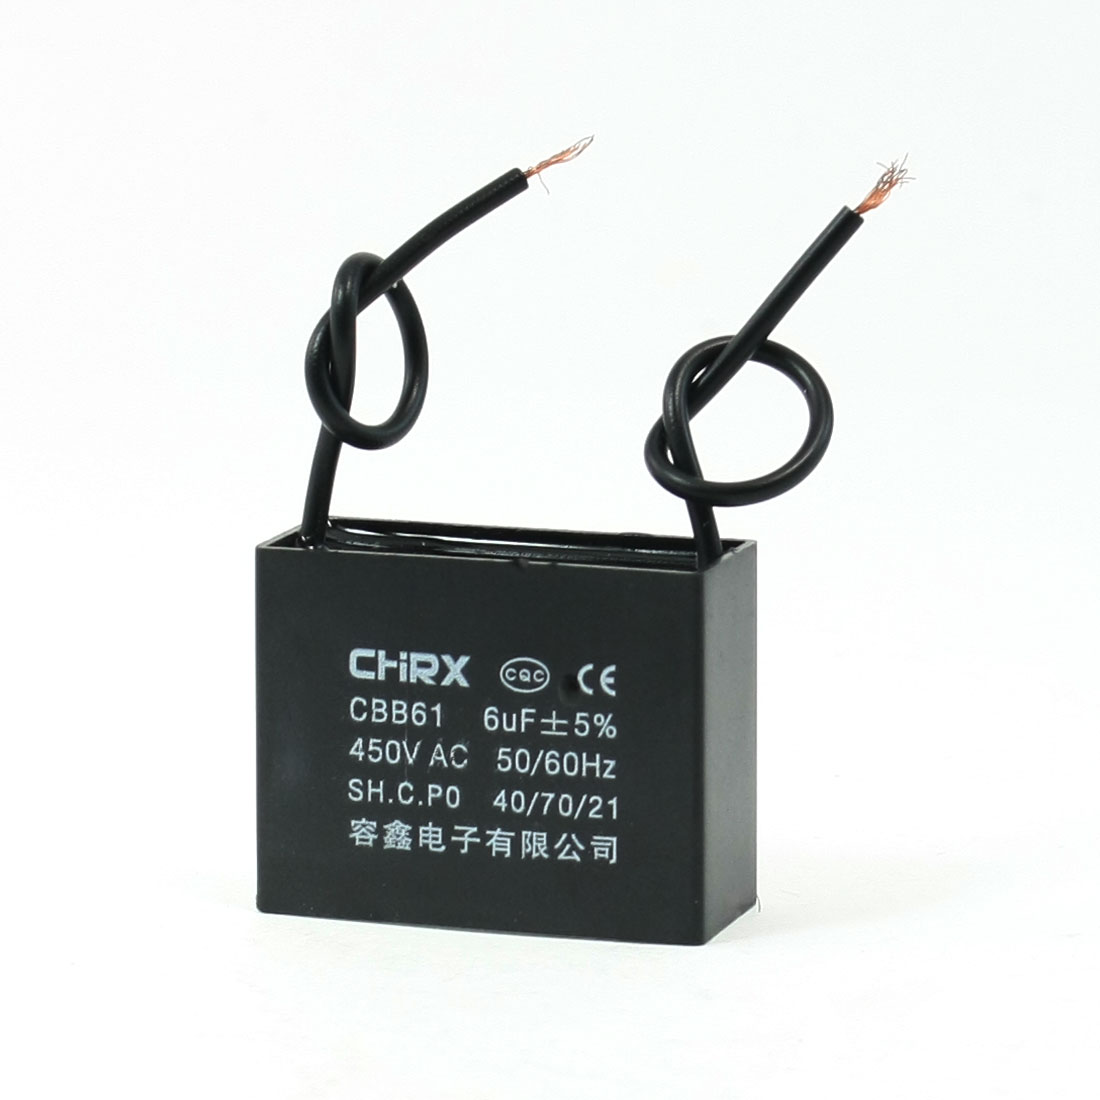 CBB61 6uF AC 450V Polypropylene Film Motor Capacitor